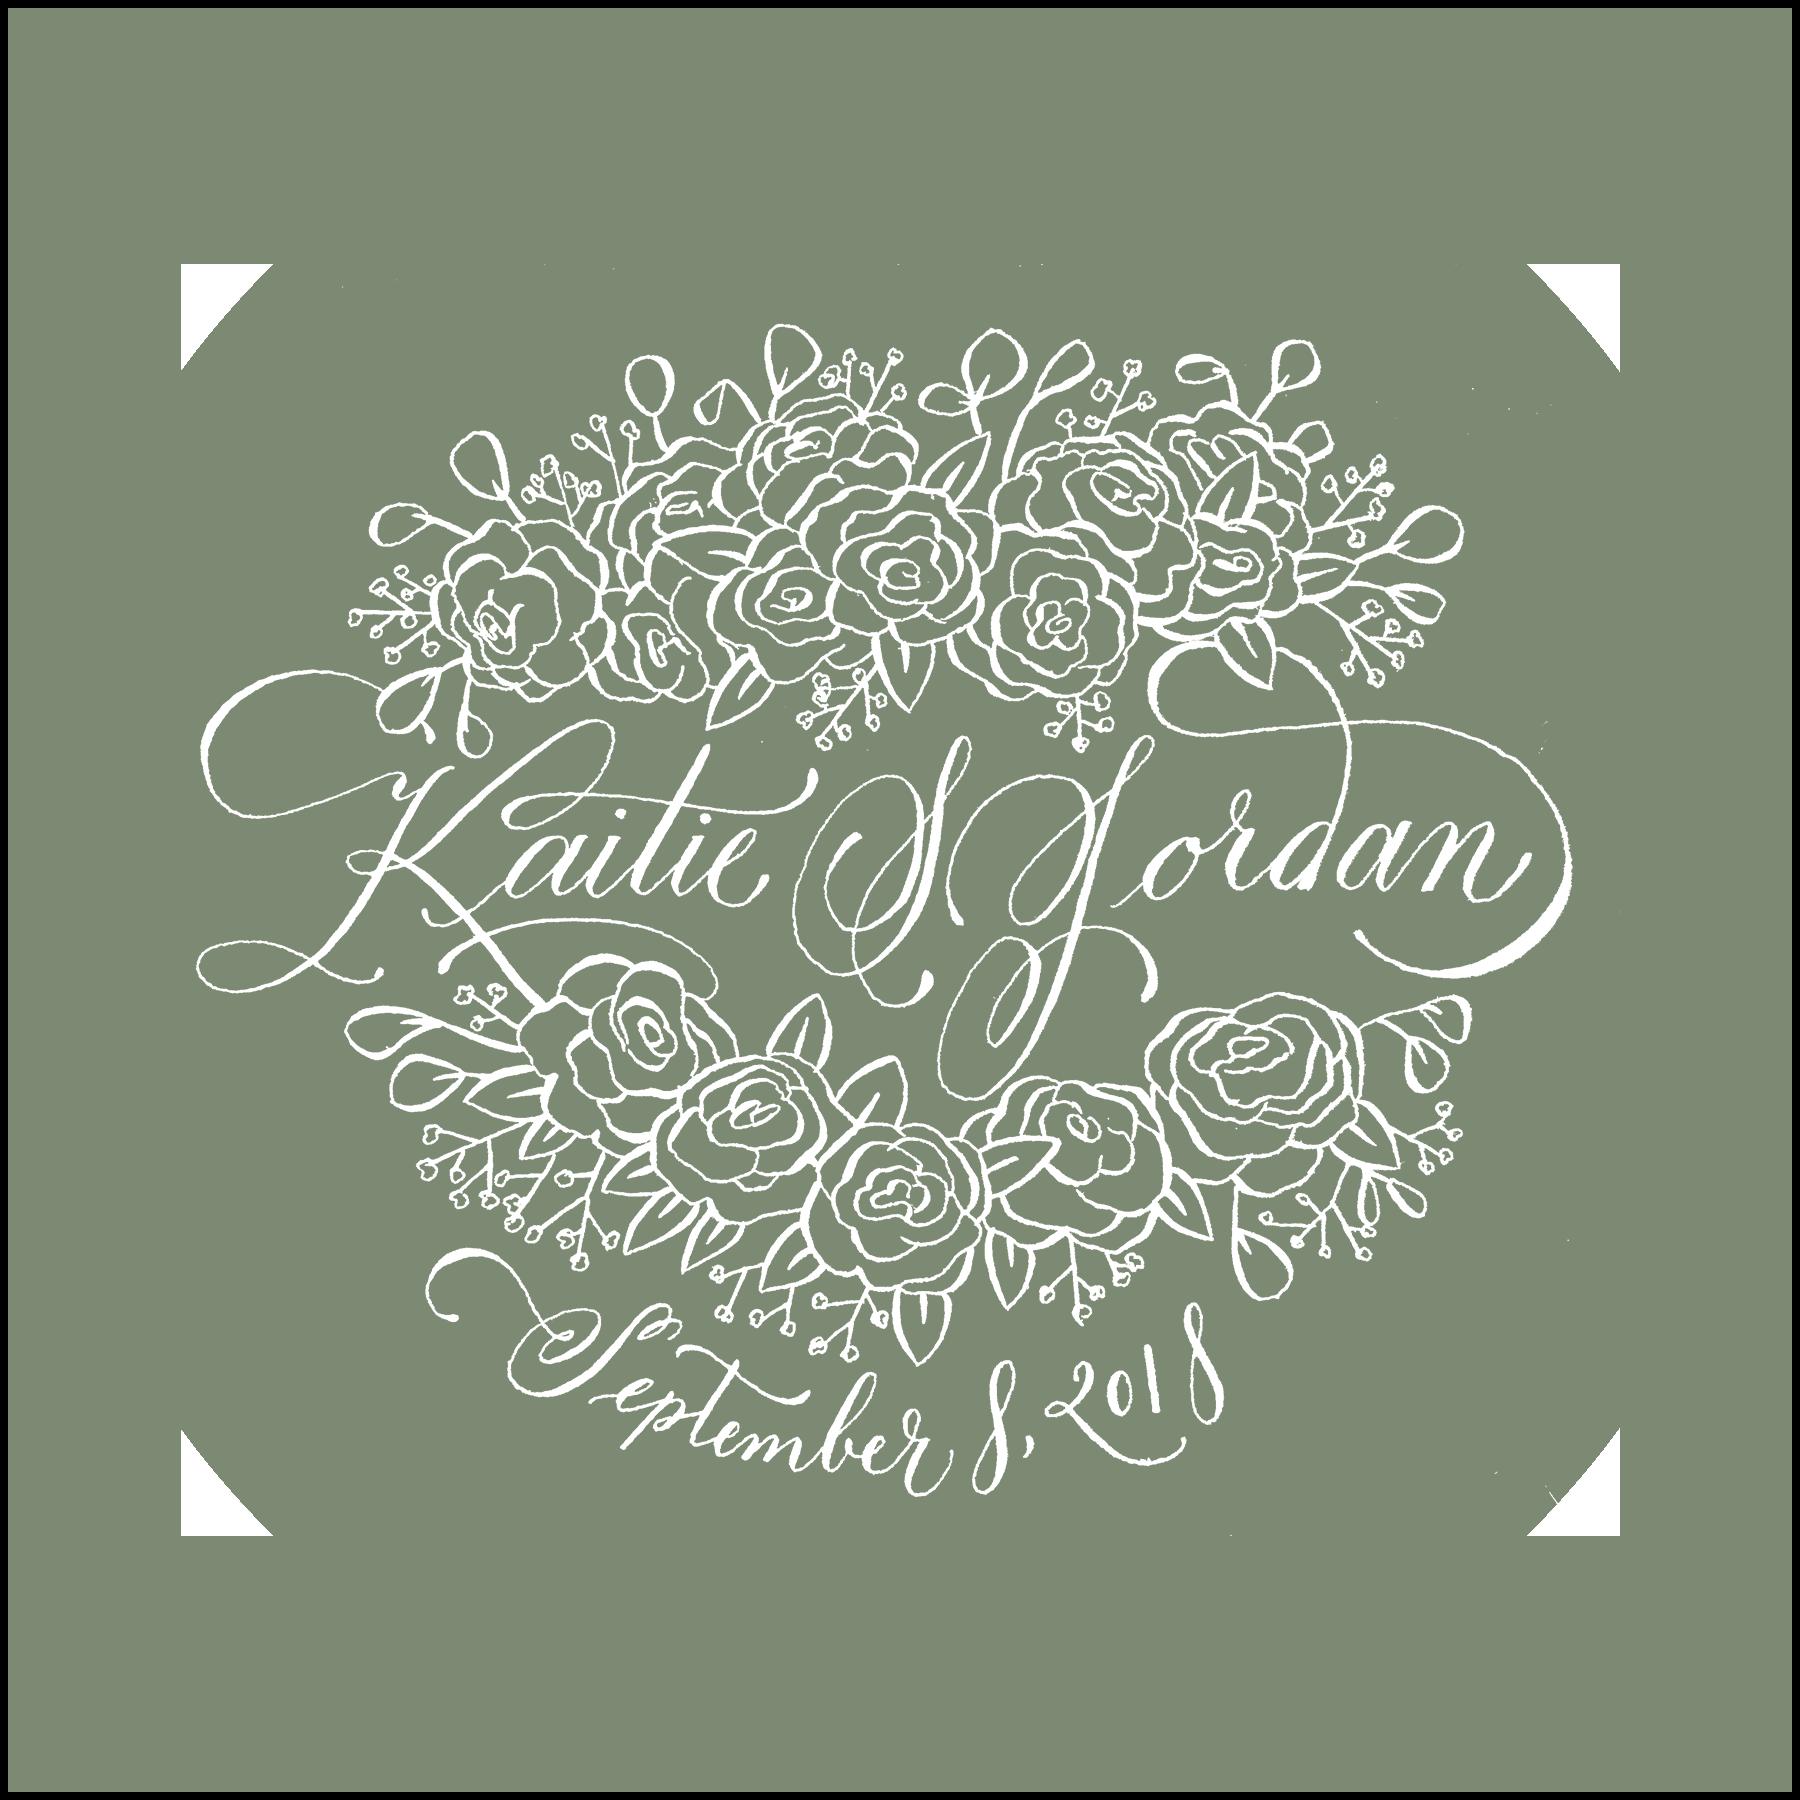 Kaitie&Jordan_WebTitle.png